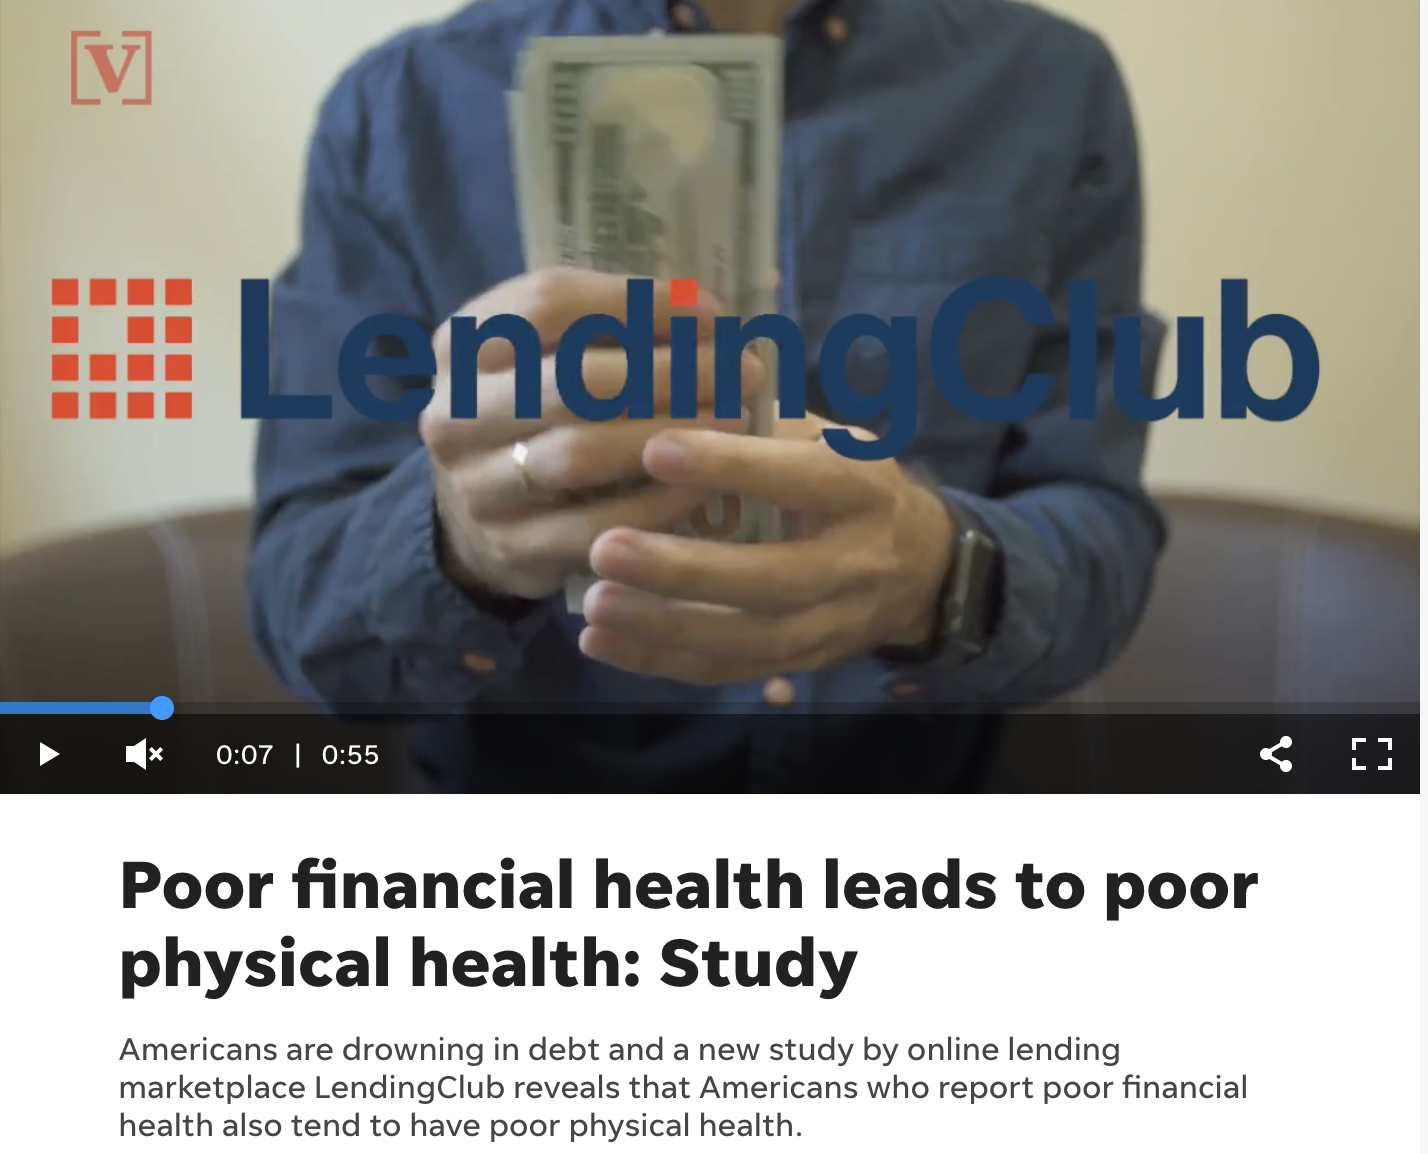 Lending Club_USA Today